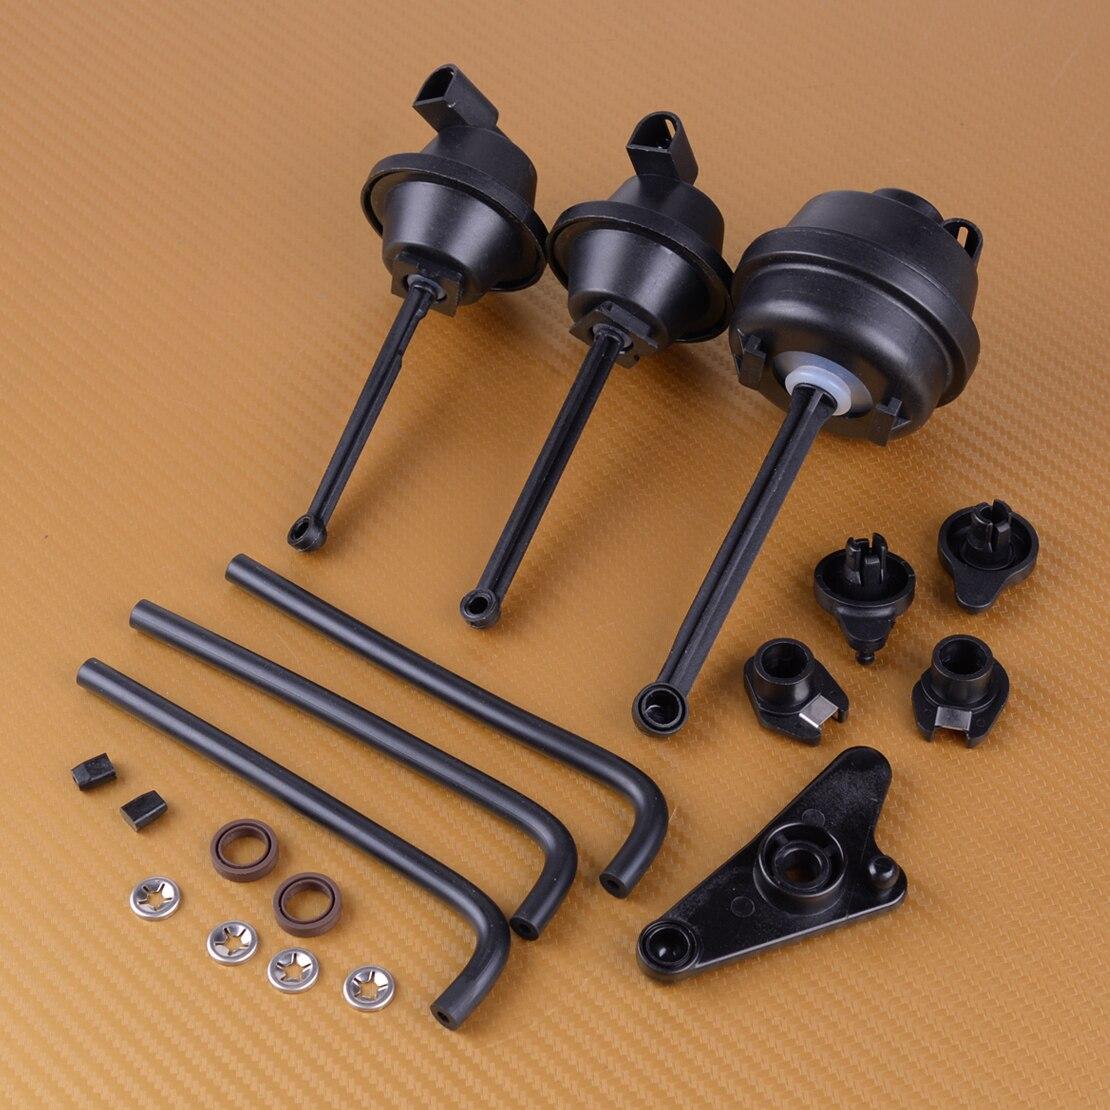 DWCX New Car Accessories Black Rubber Intake Manifold Air Flap Runner Repair Kit 2721402401 Fit for Mercedes Benz C230 C280 C350|Intake Manifold| |  - title=